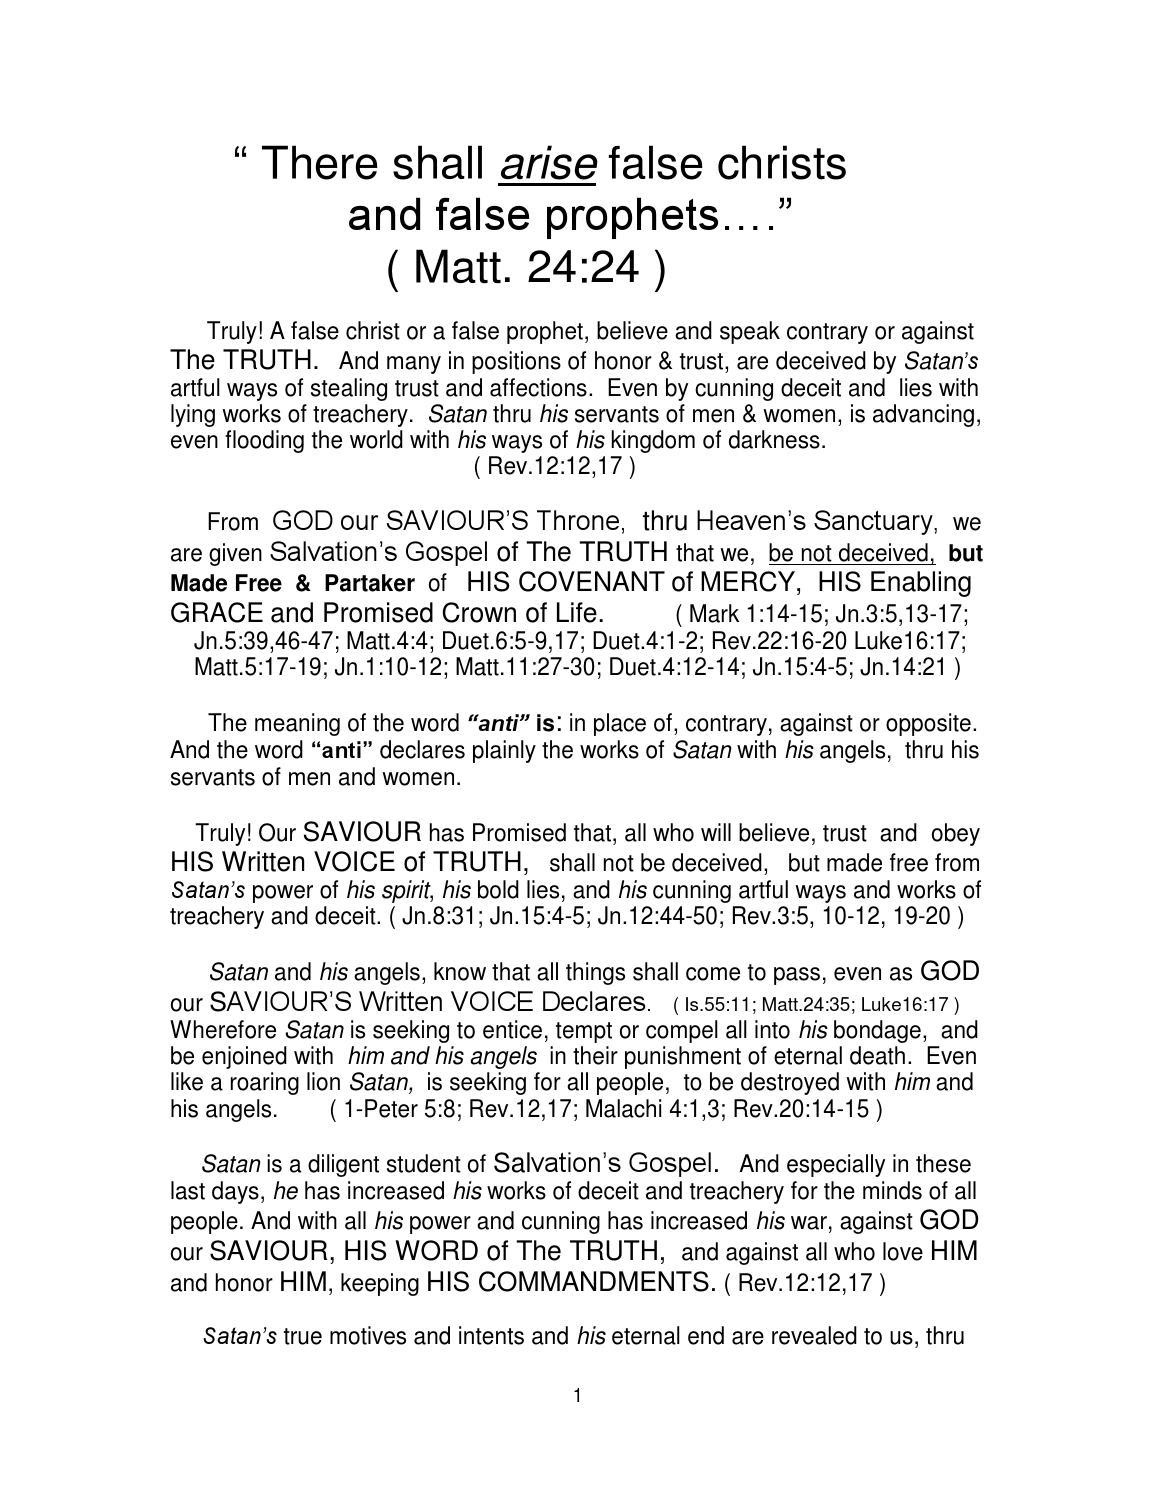 False christs & false prophets searchable 1 by Voice Of